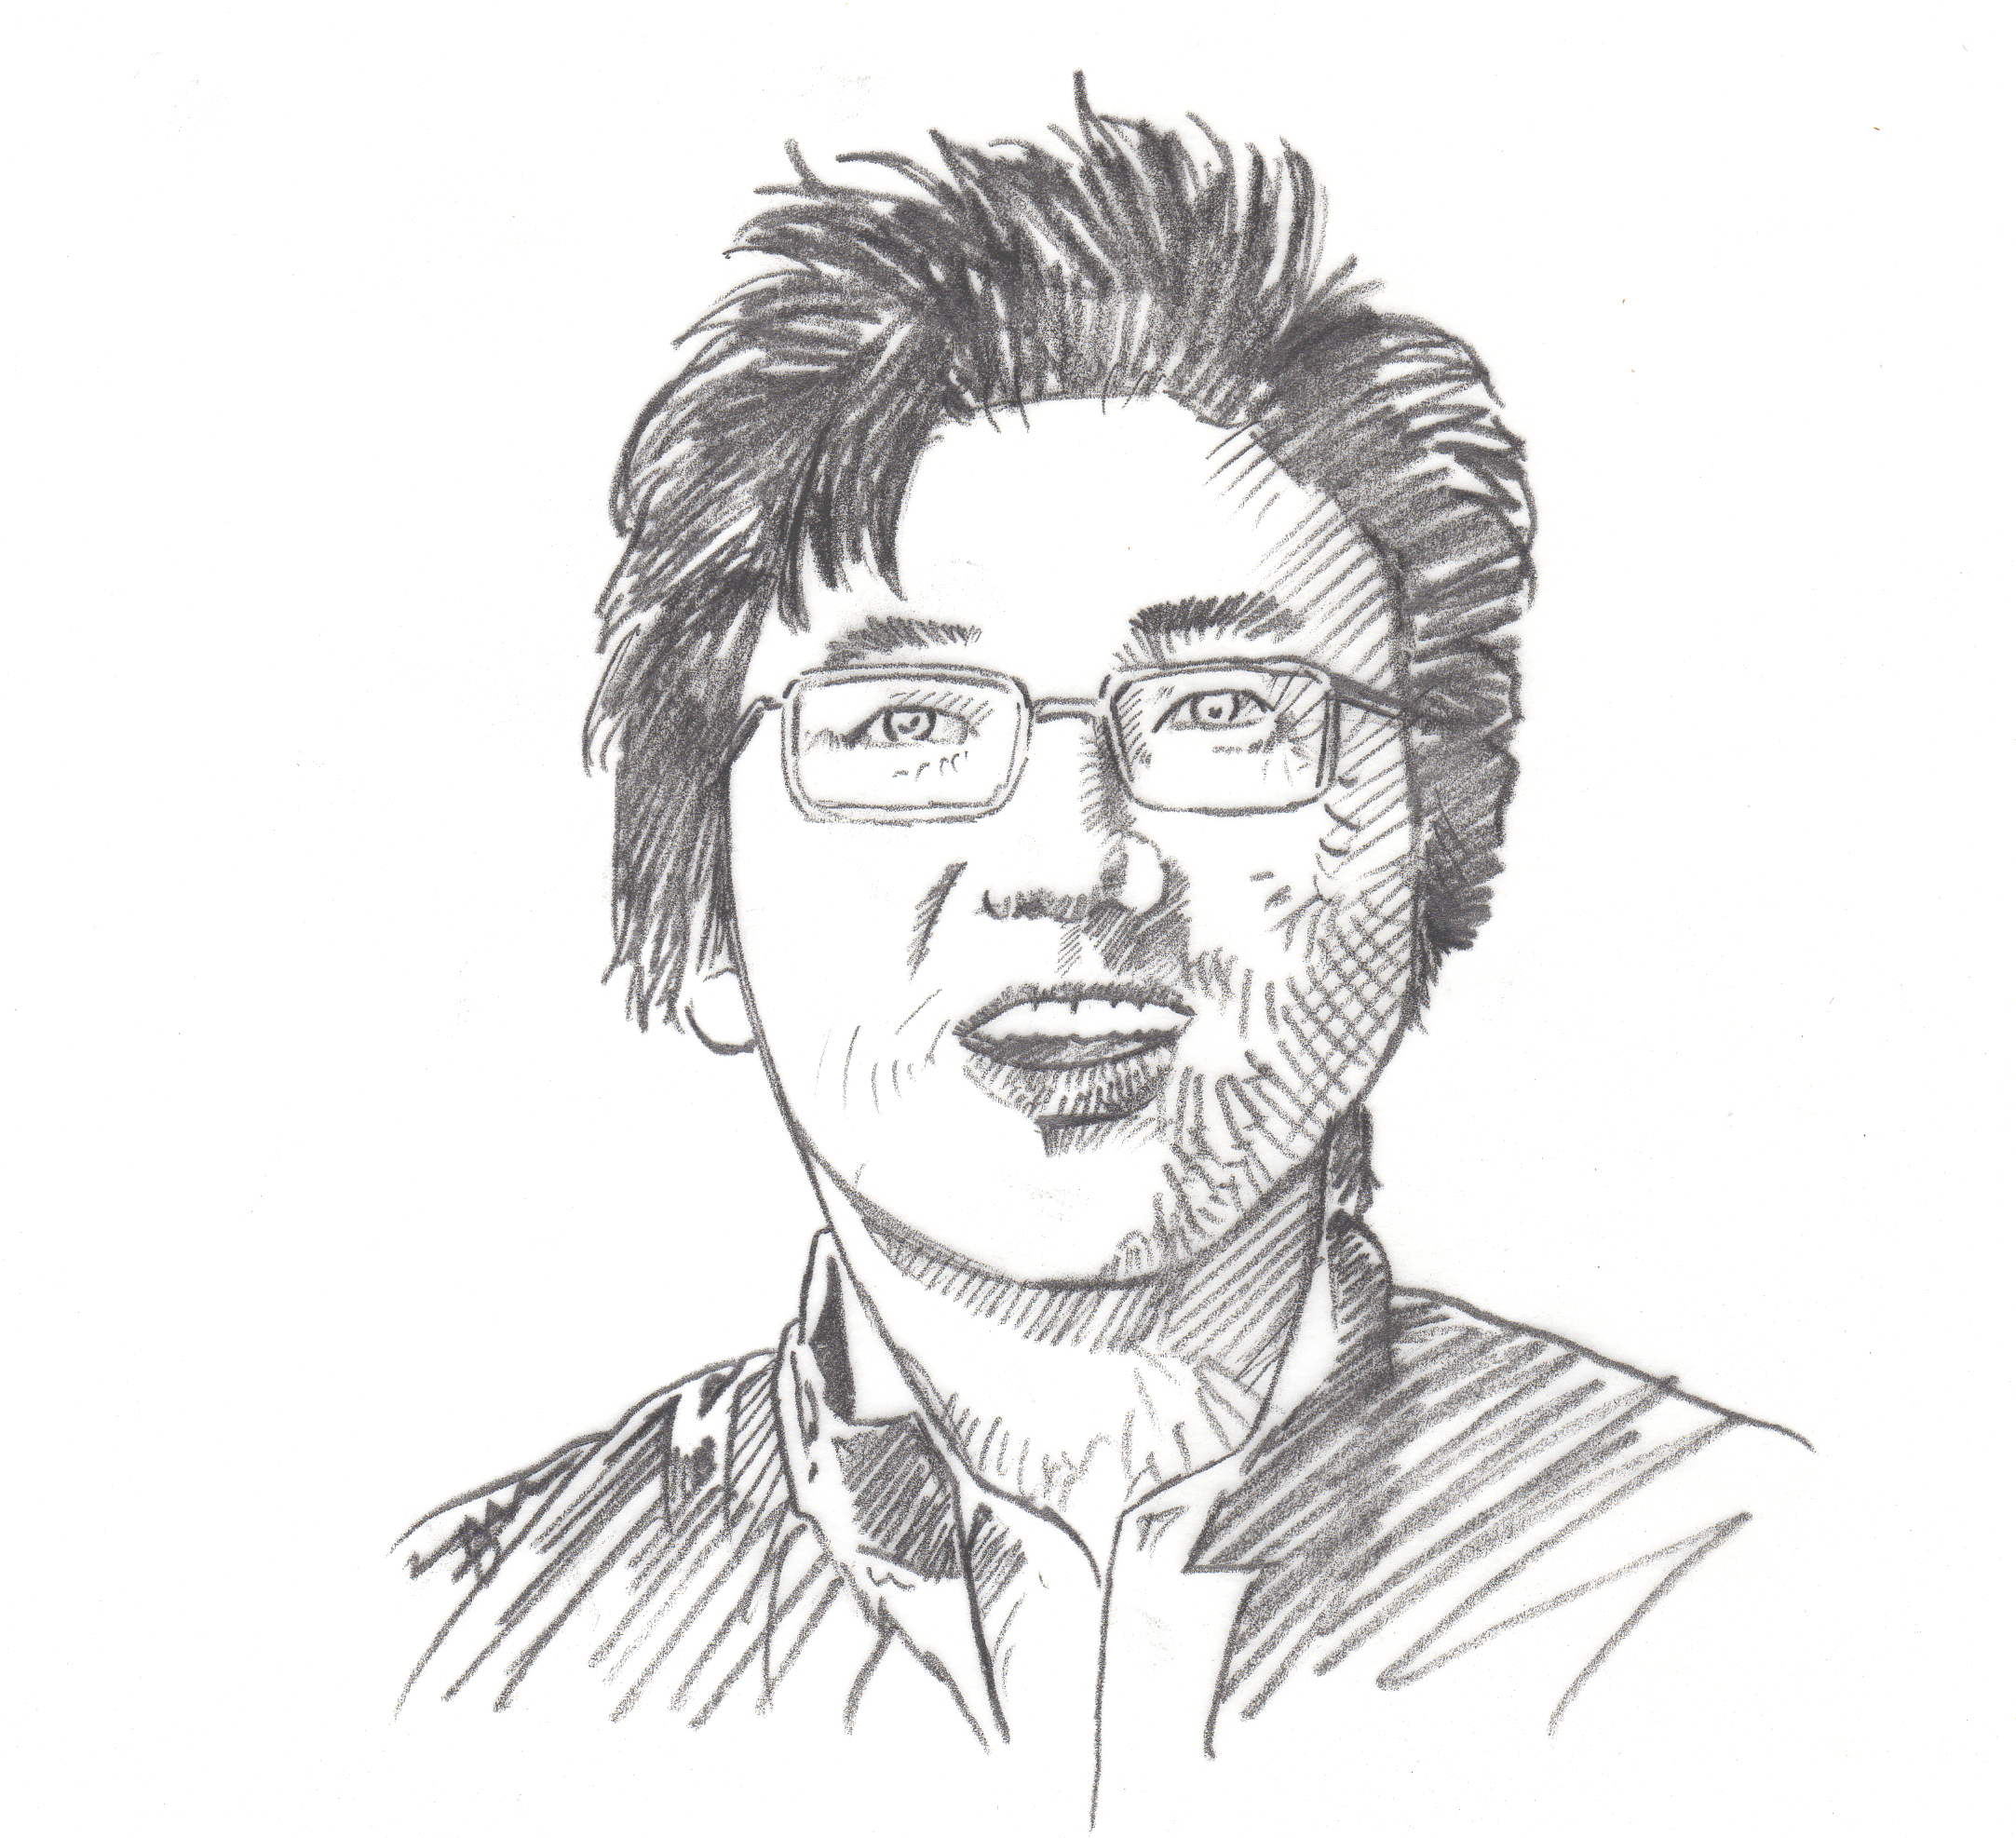 Hiro Sketch 2